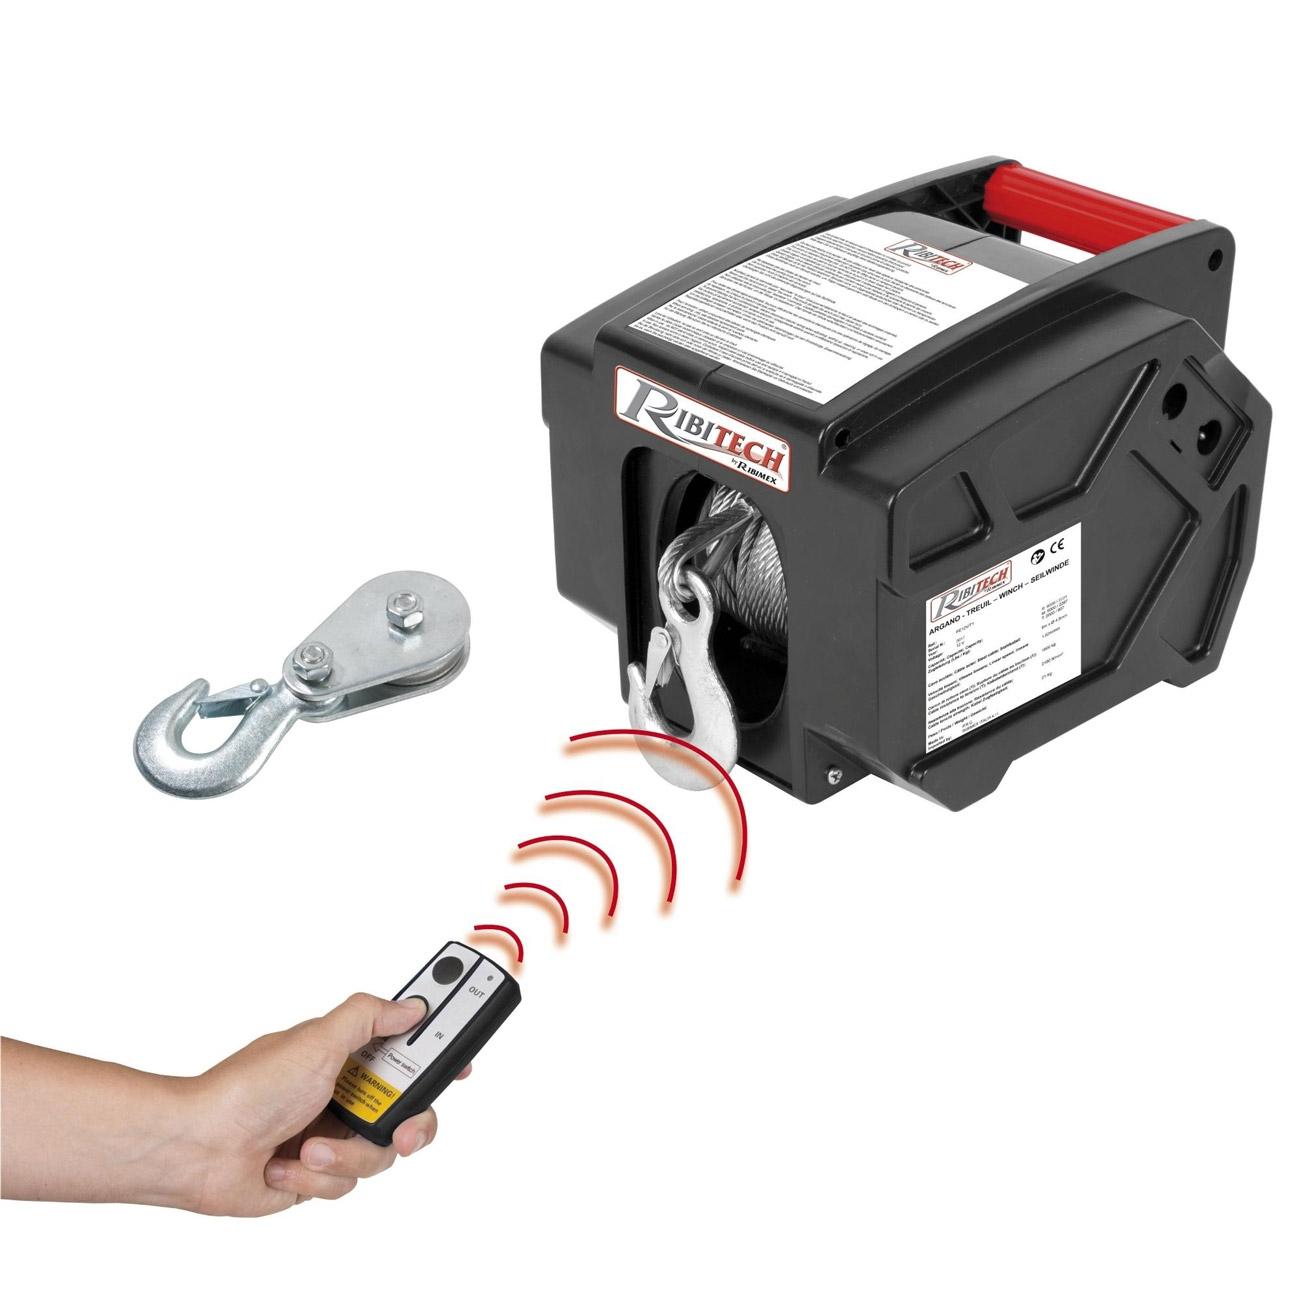 Ribimex PE12V / T Remote Controlled Electric Winch